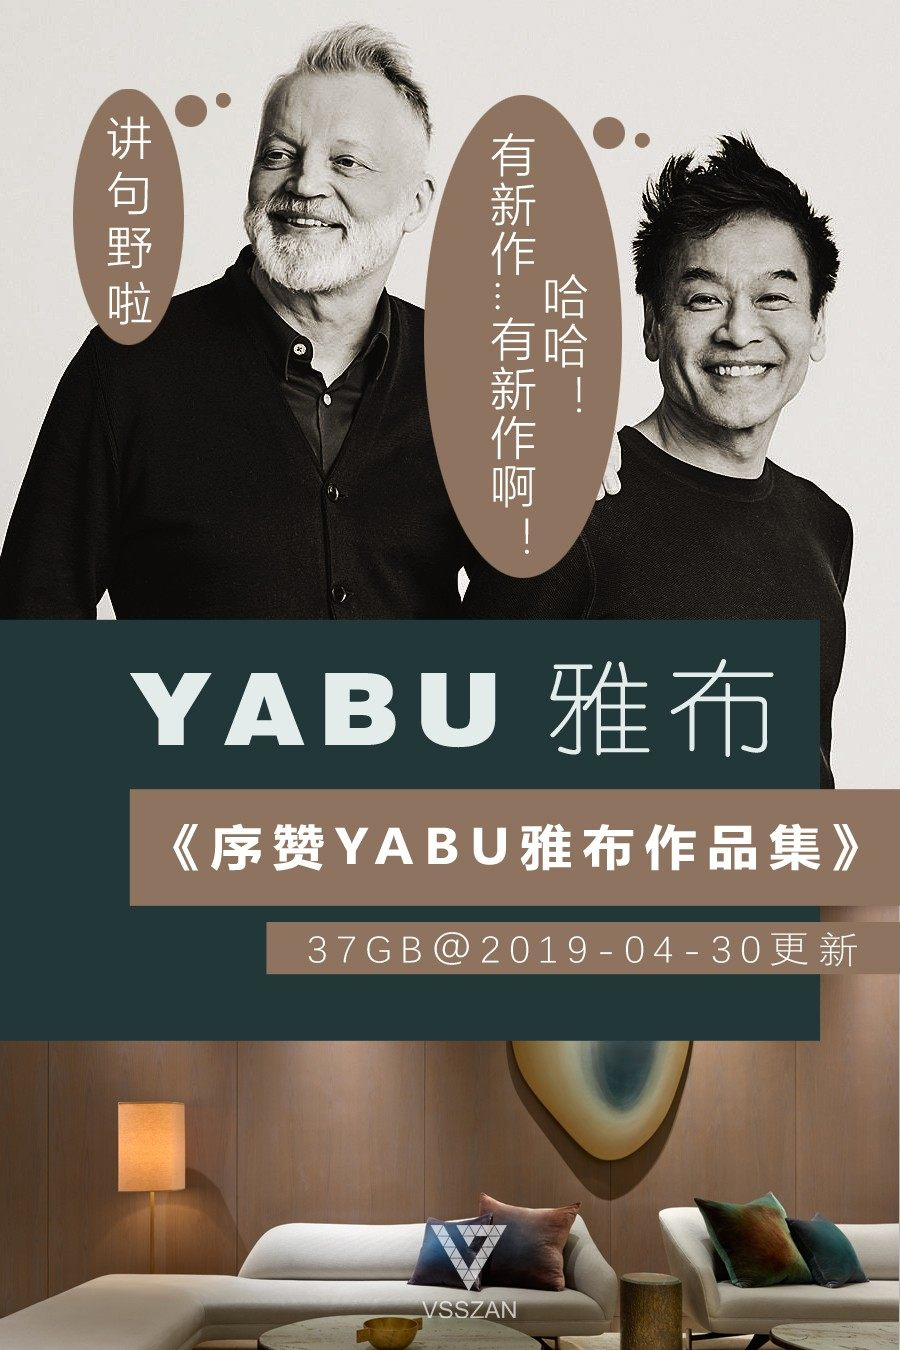 ad_yabu20190501.jpg